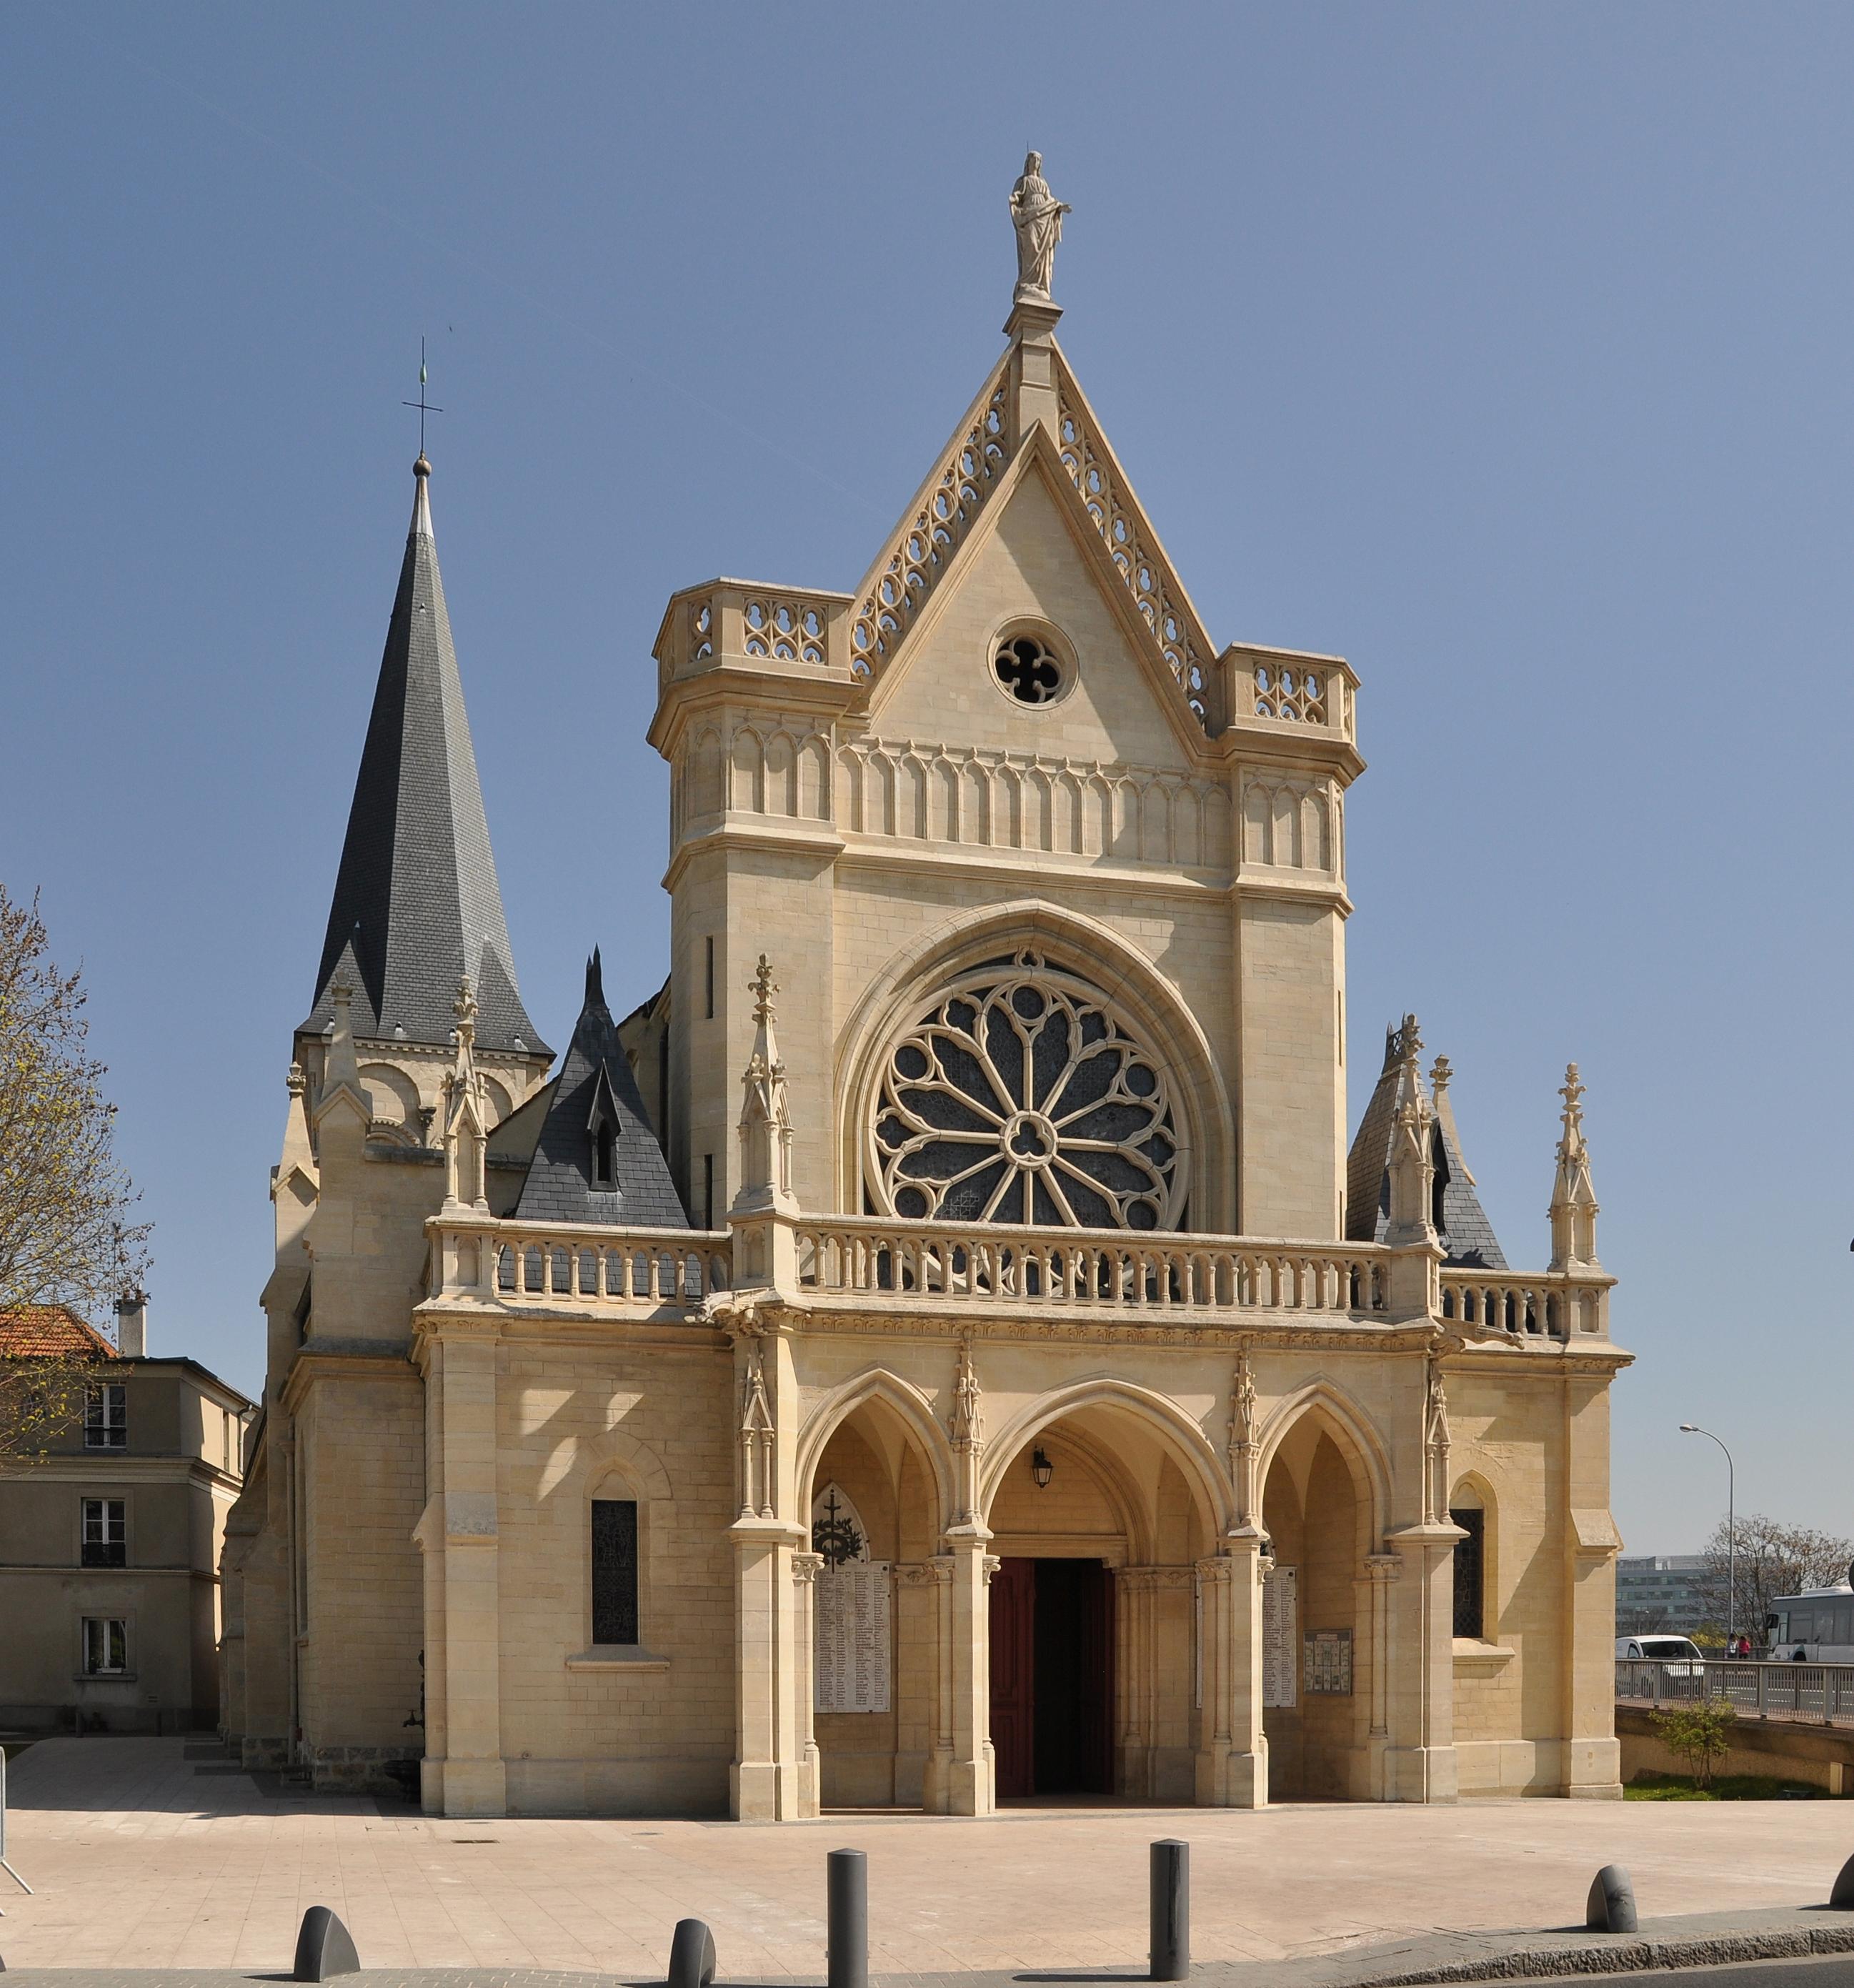 a description of the notre dame de paris a large cathedral church Follow this suggested itinerary for your own tour of france's best cathedrals,  each page for a description of each  cathedral tour stop one: notre-dame de paris.